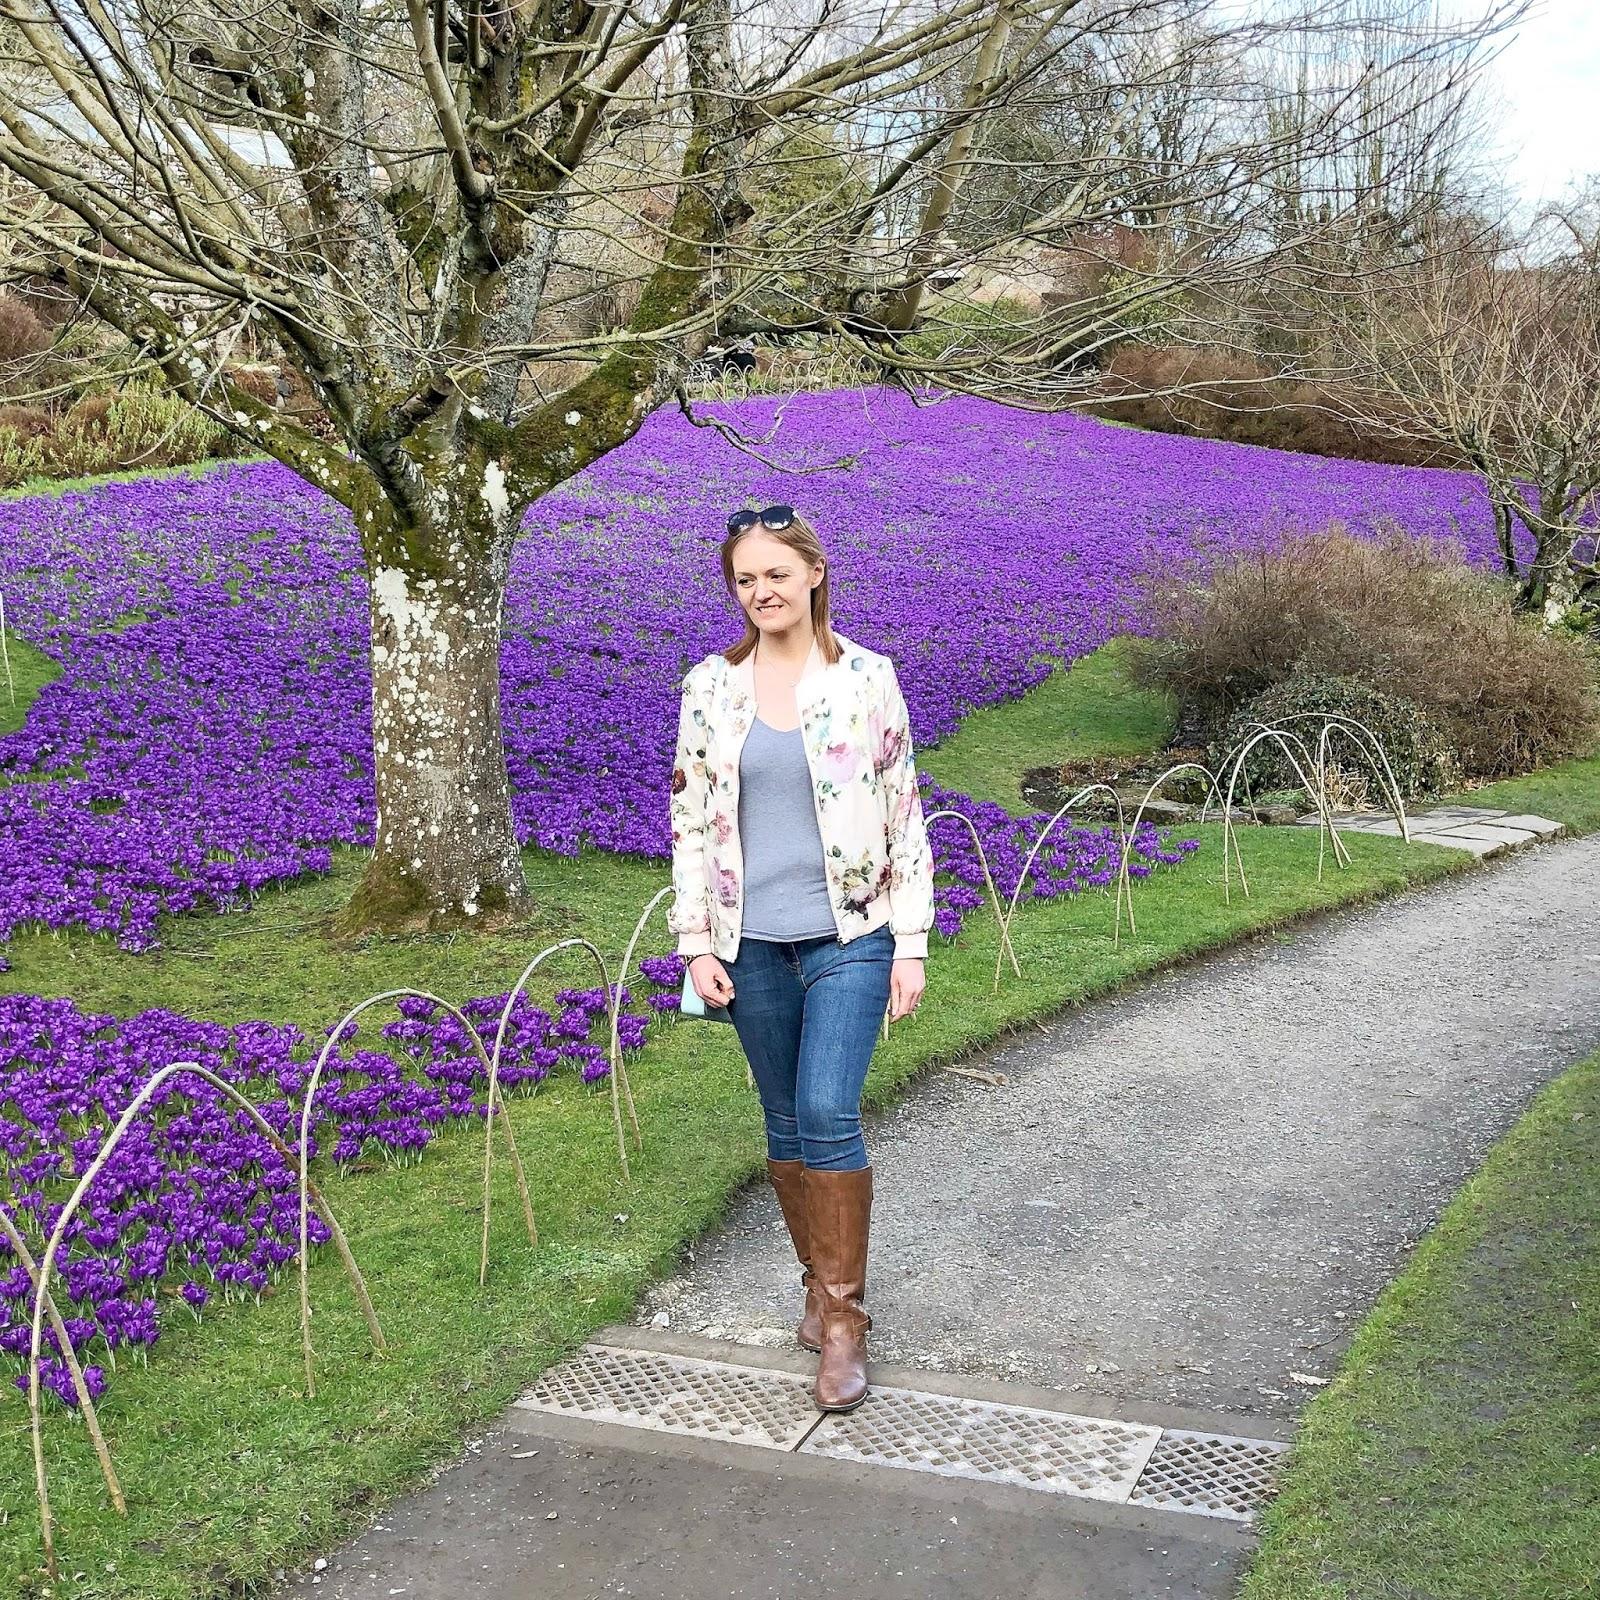 New Girl in Toon - Wallington Crocus Lawn